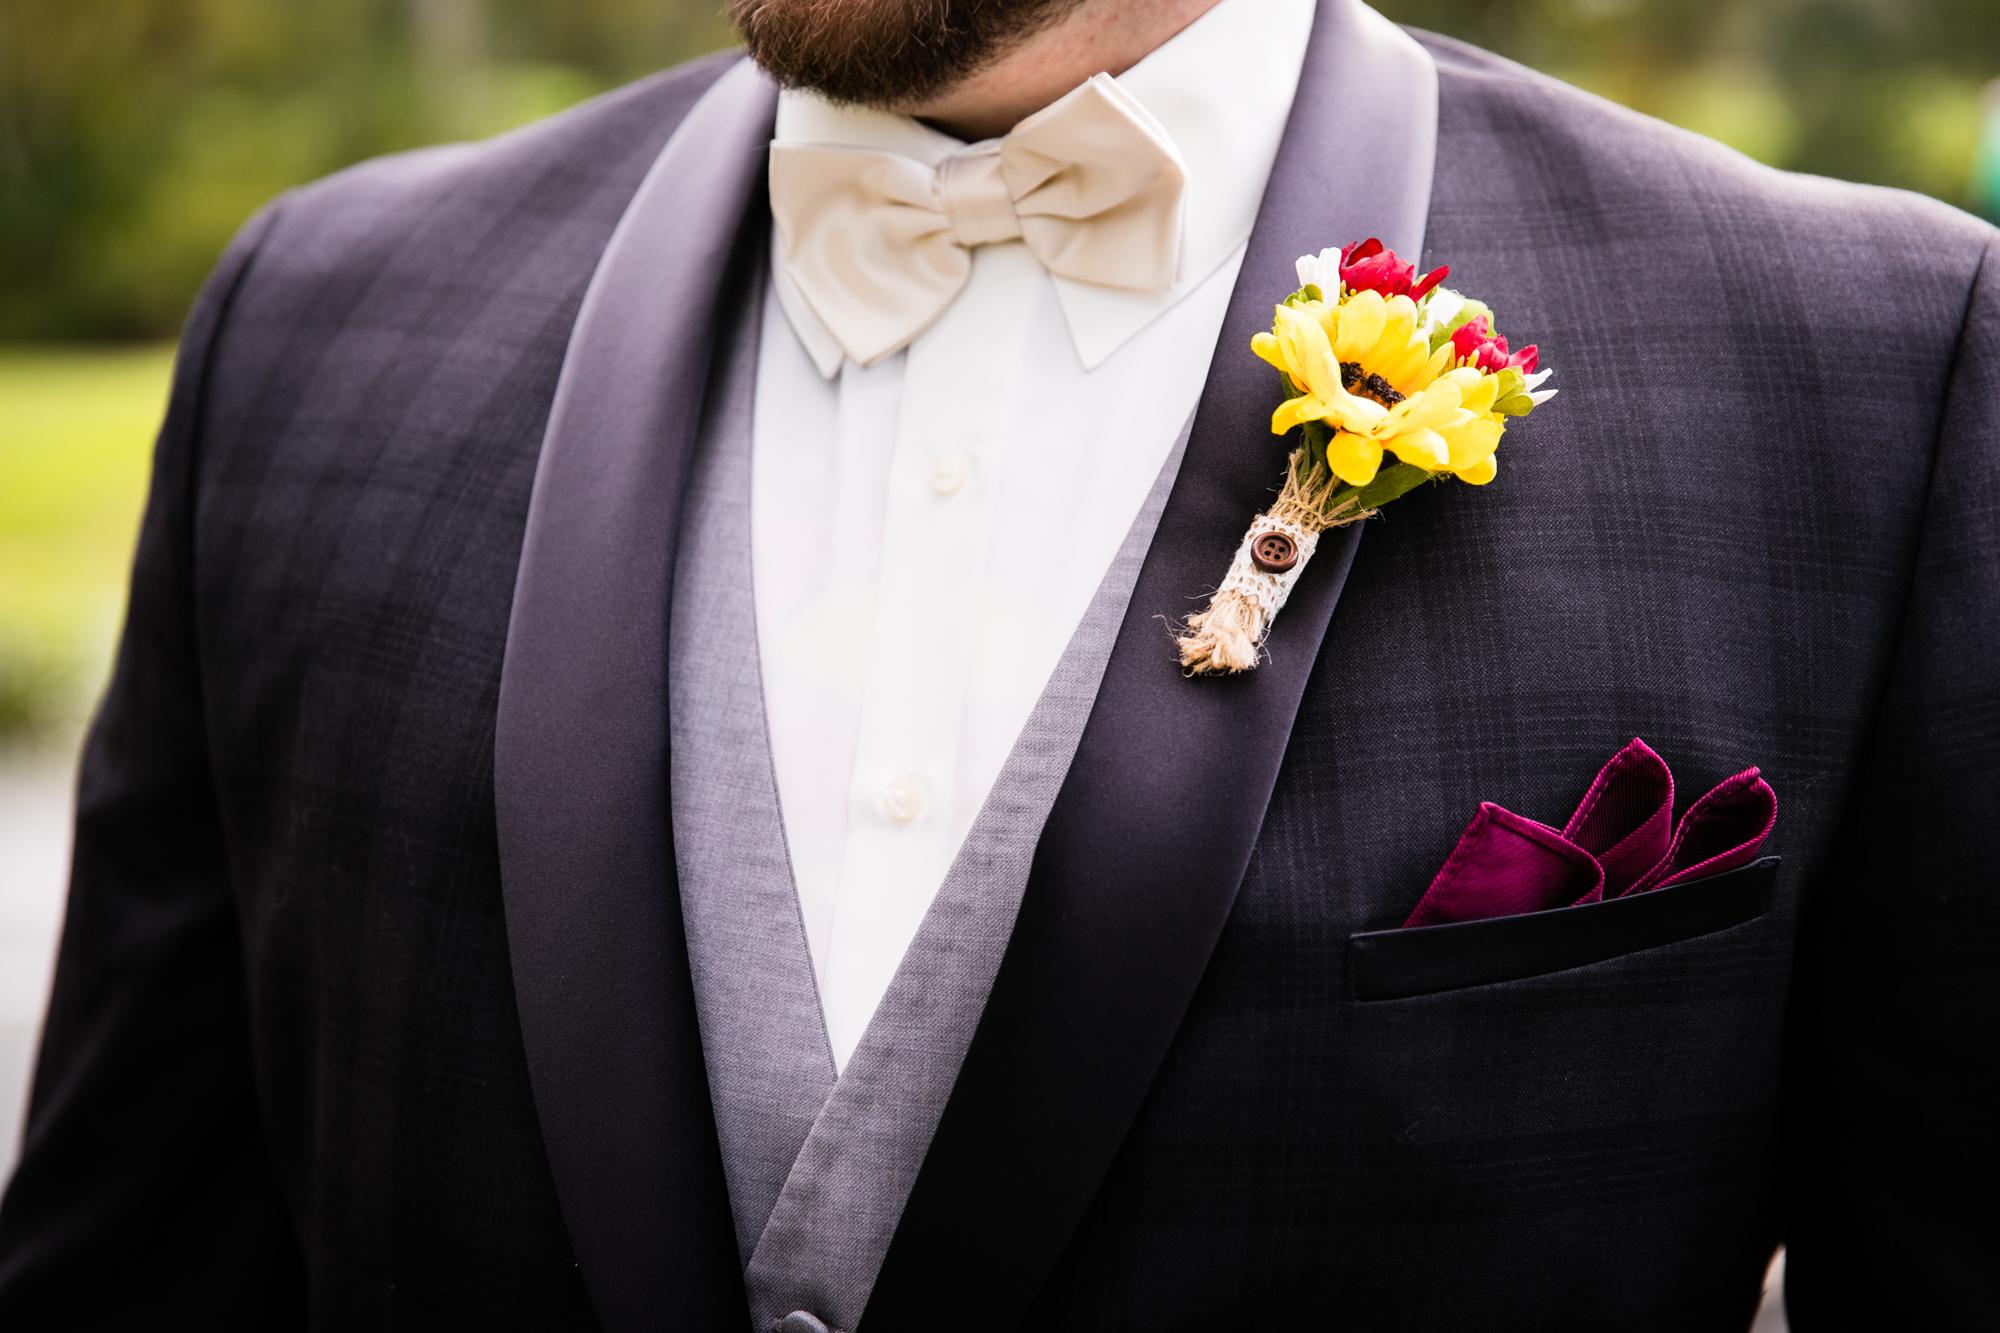 Cedar Brook Country Club Wedding Photography - Lovestruck Pictures-023.jpg